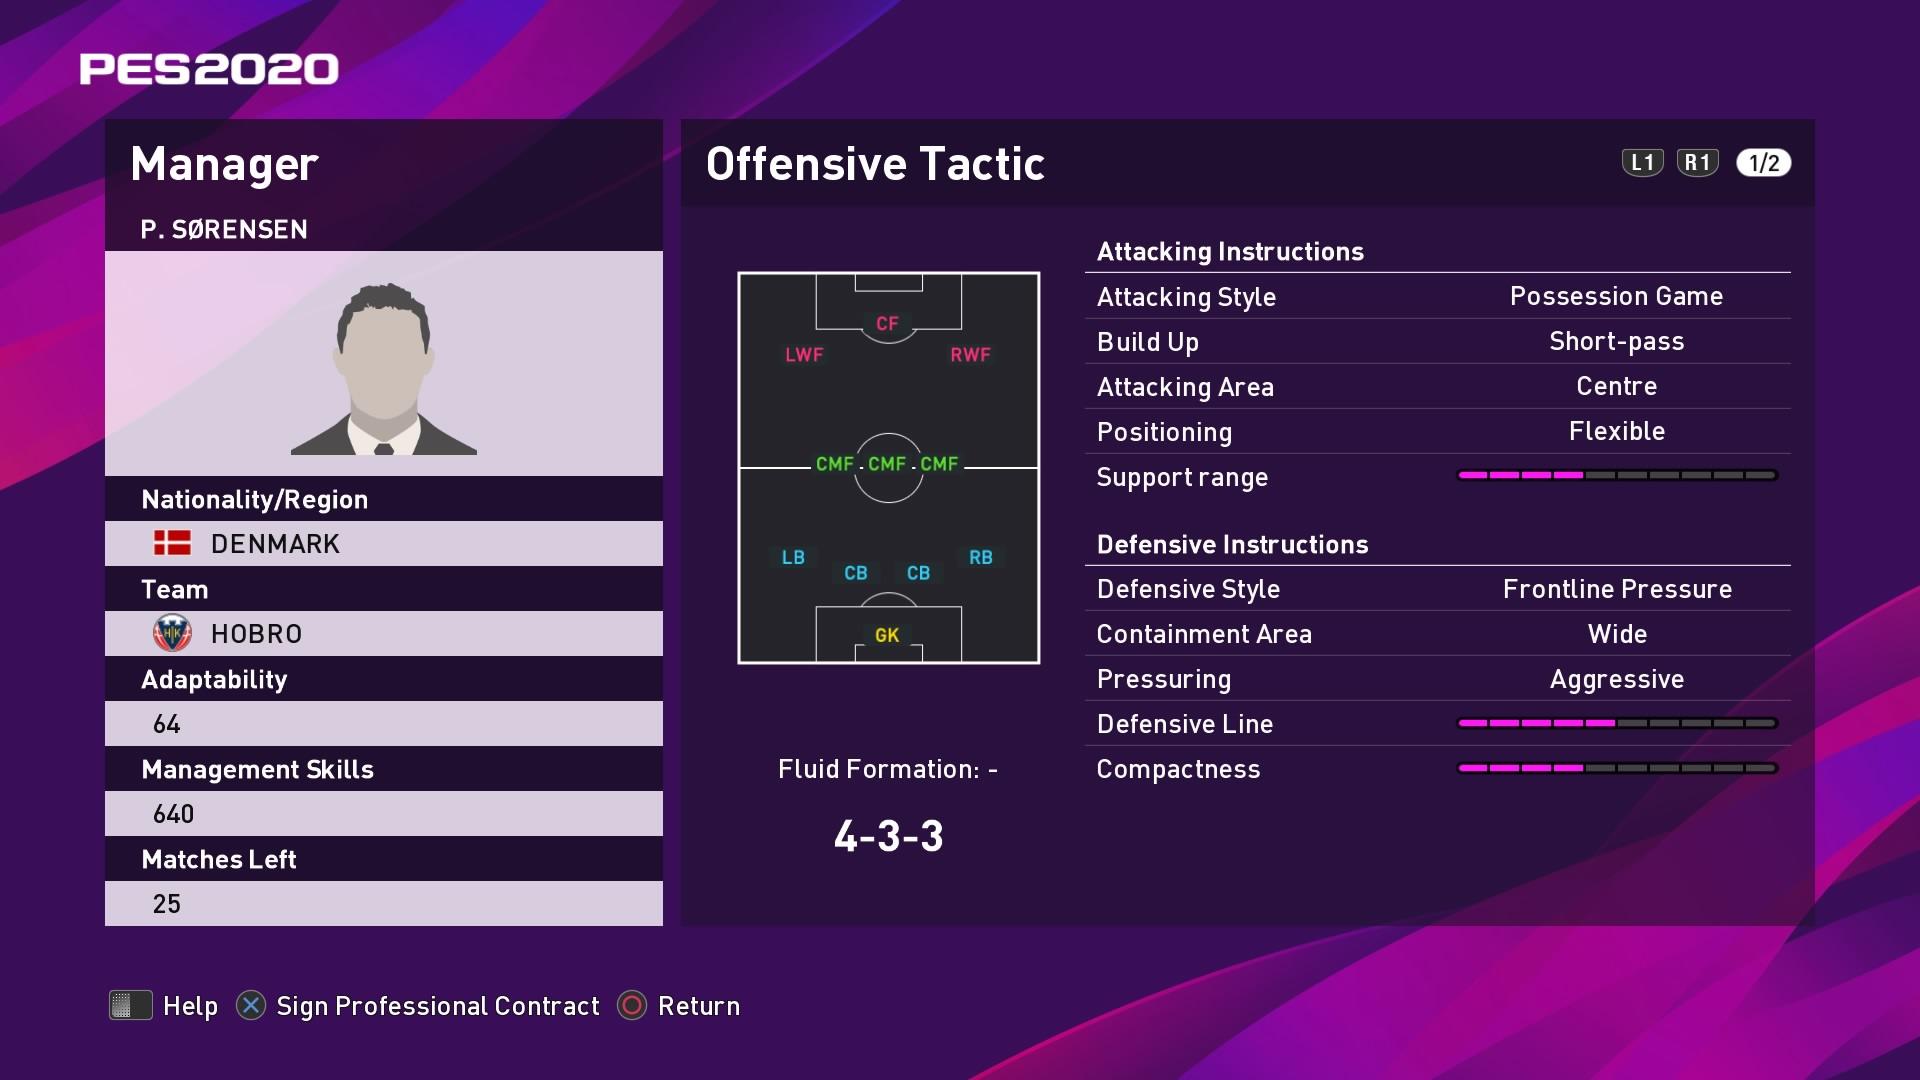 P. Sørensen (Peter Sørensen) Offensive Tactic in PES 2020 myClub